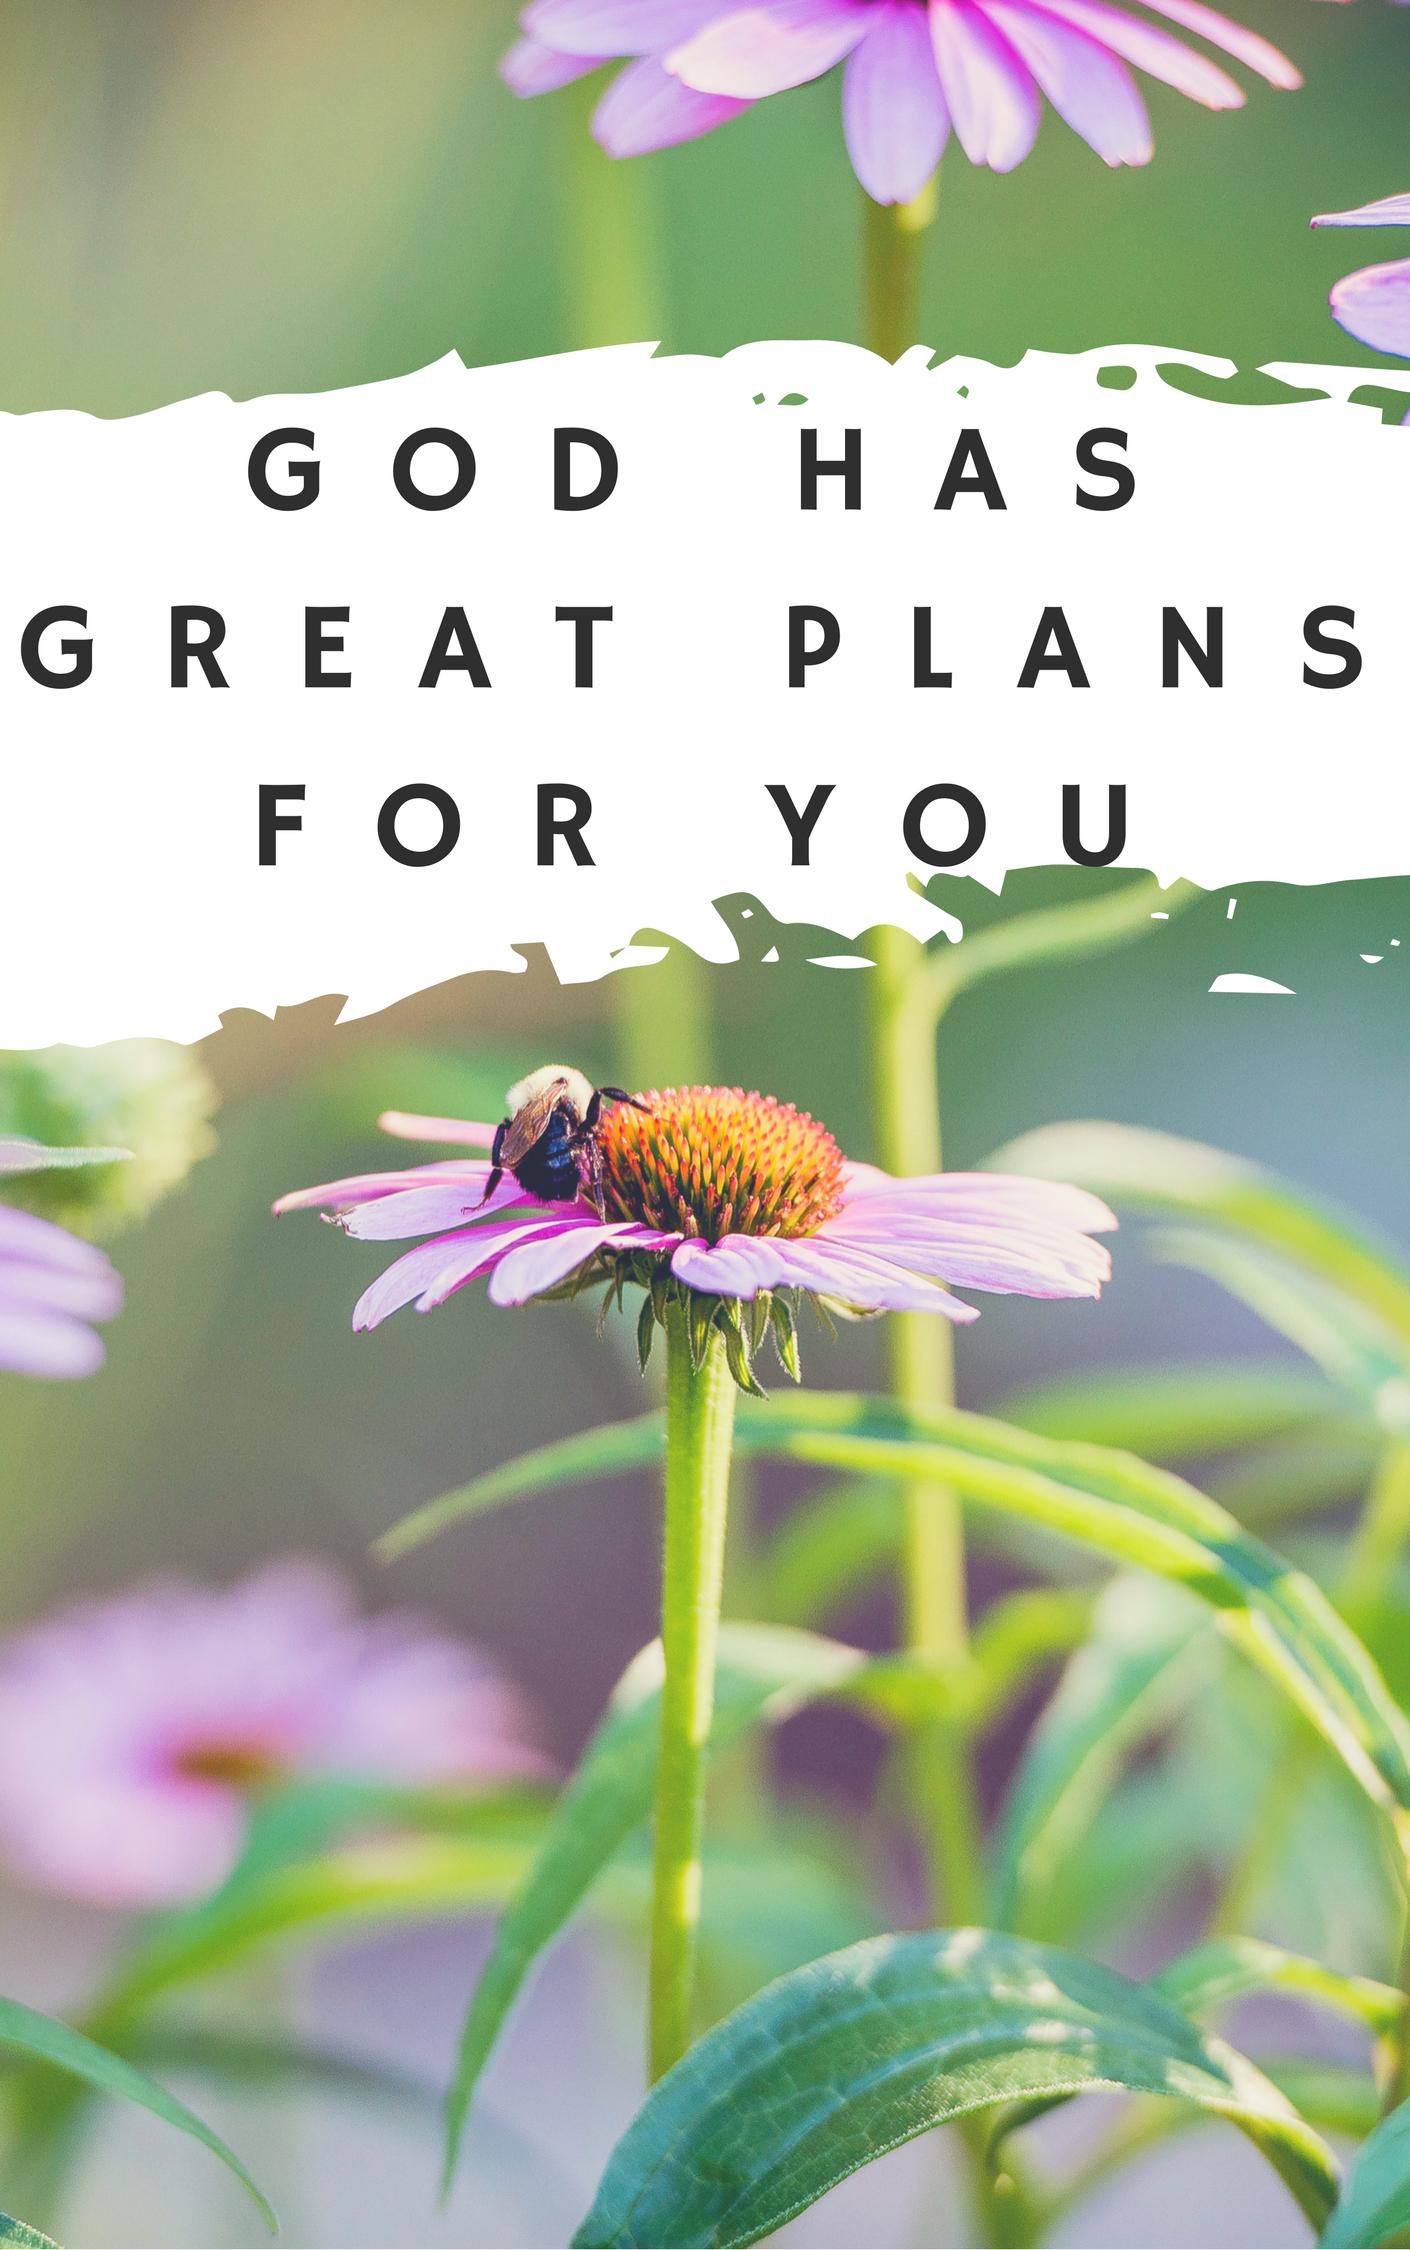 Free Printable Christian Birthday Card With Scripture | Christian - Free Printable Christian Cards Online